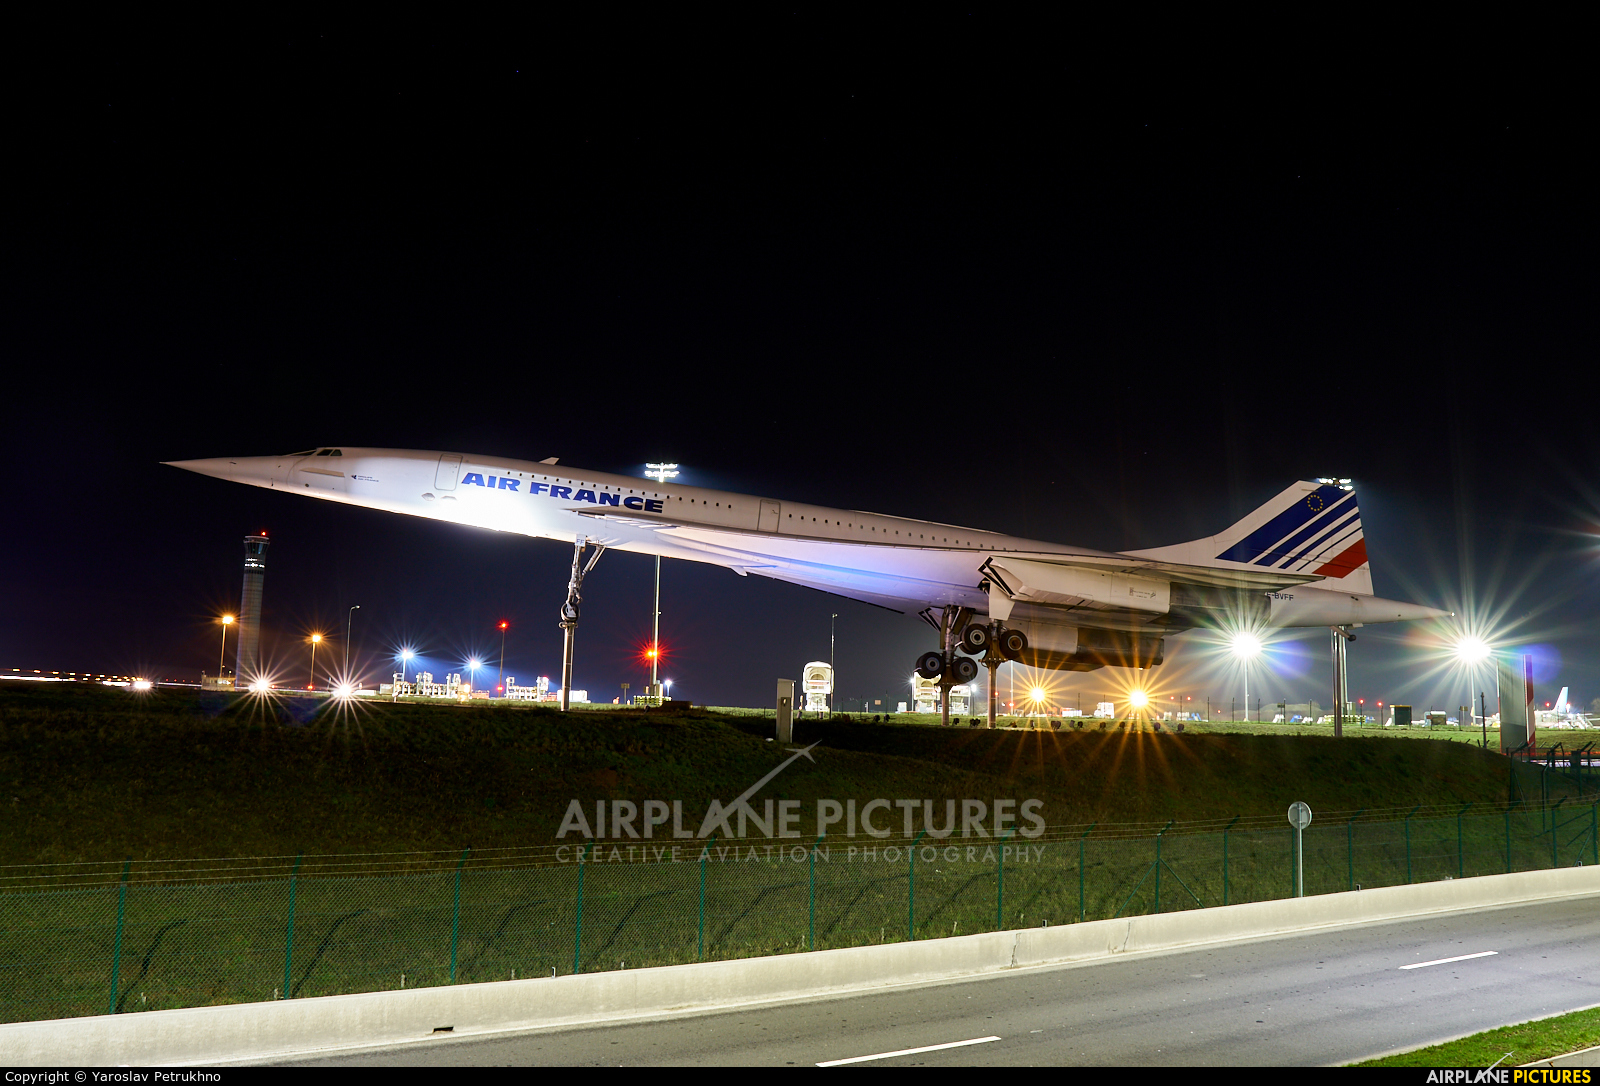 Air France F-BVFF aircraft at Paris - Charles de Gaulle